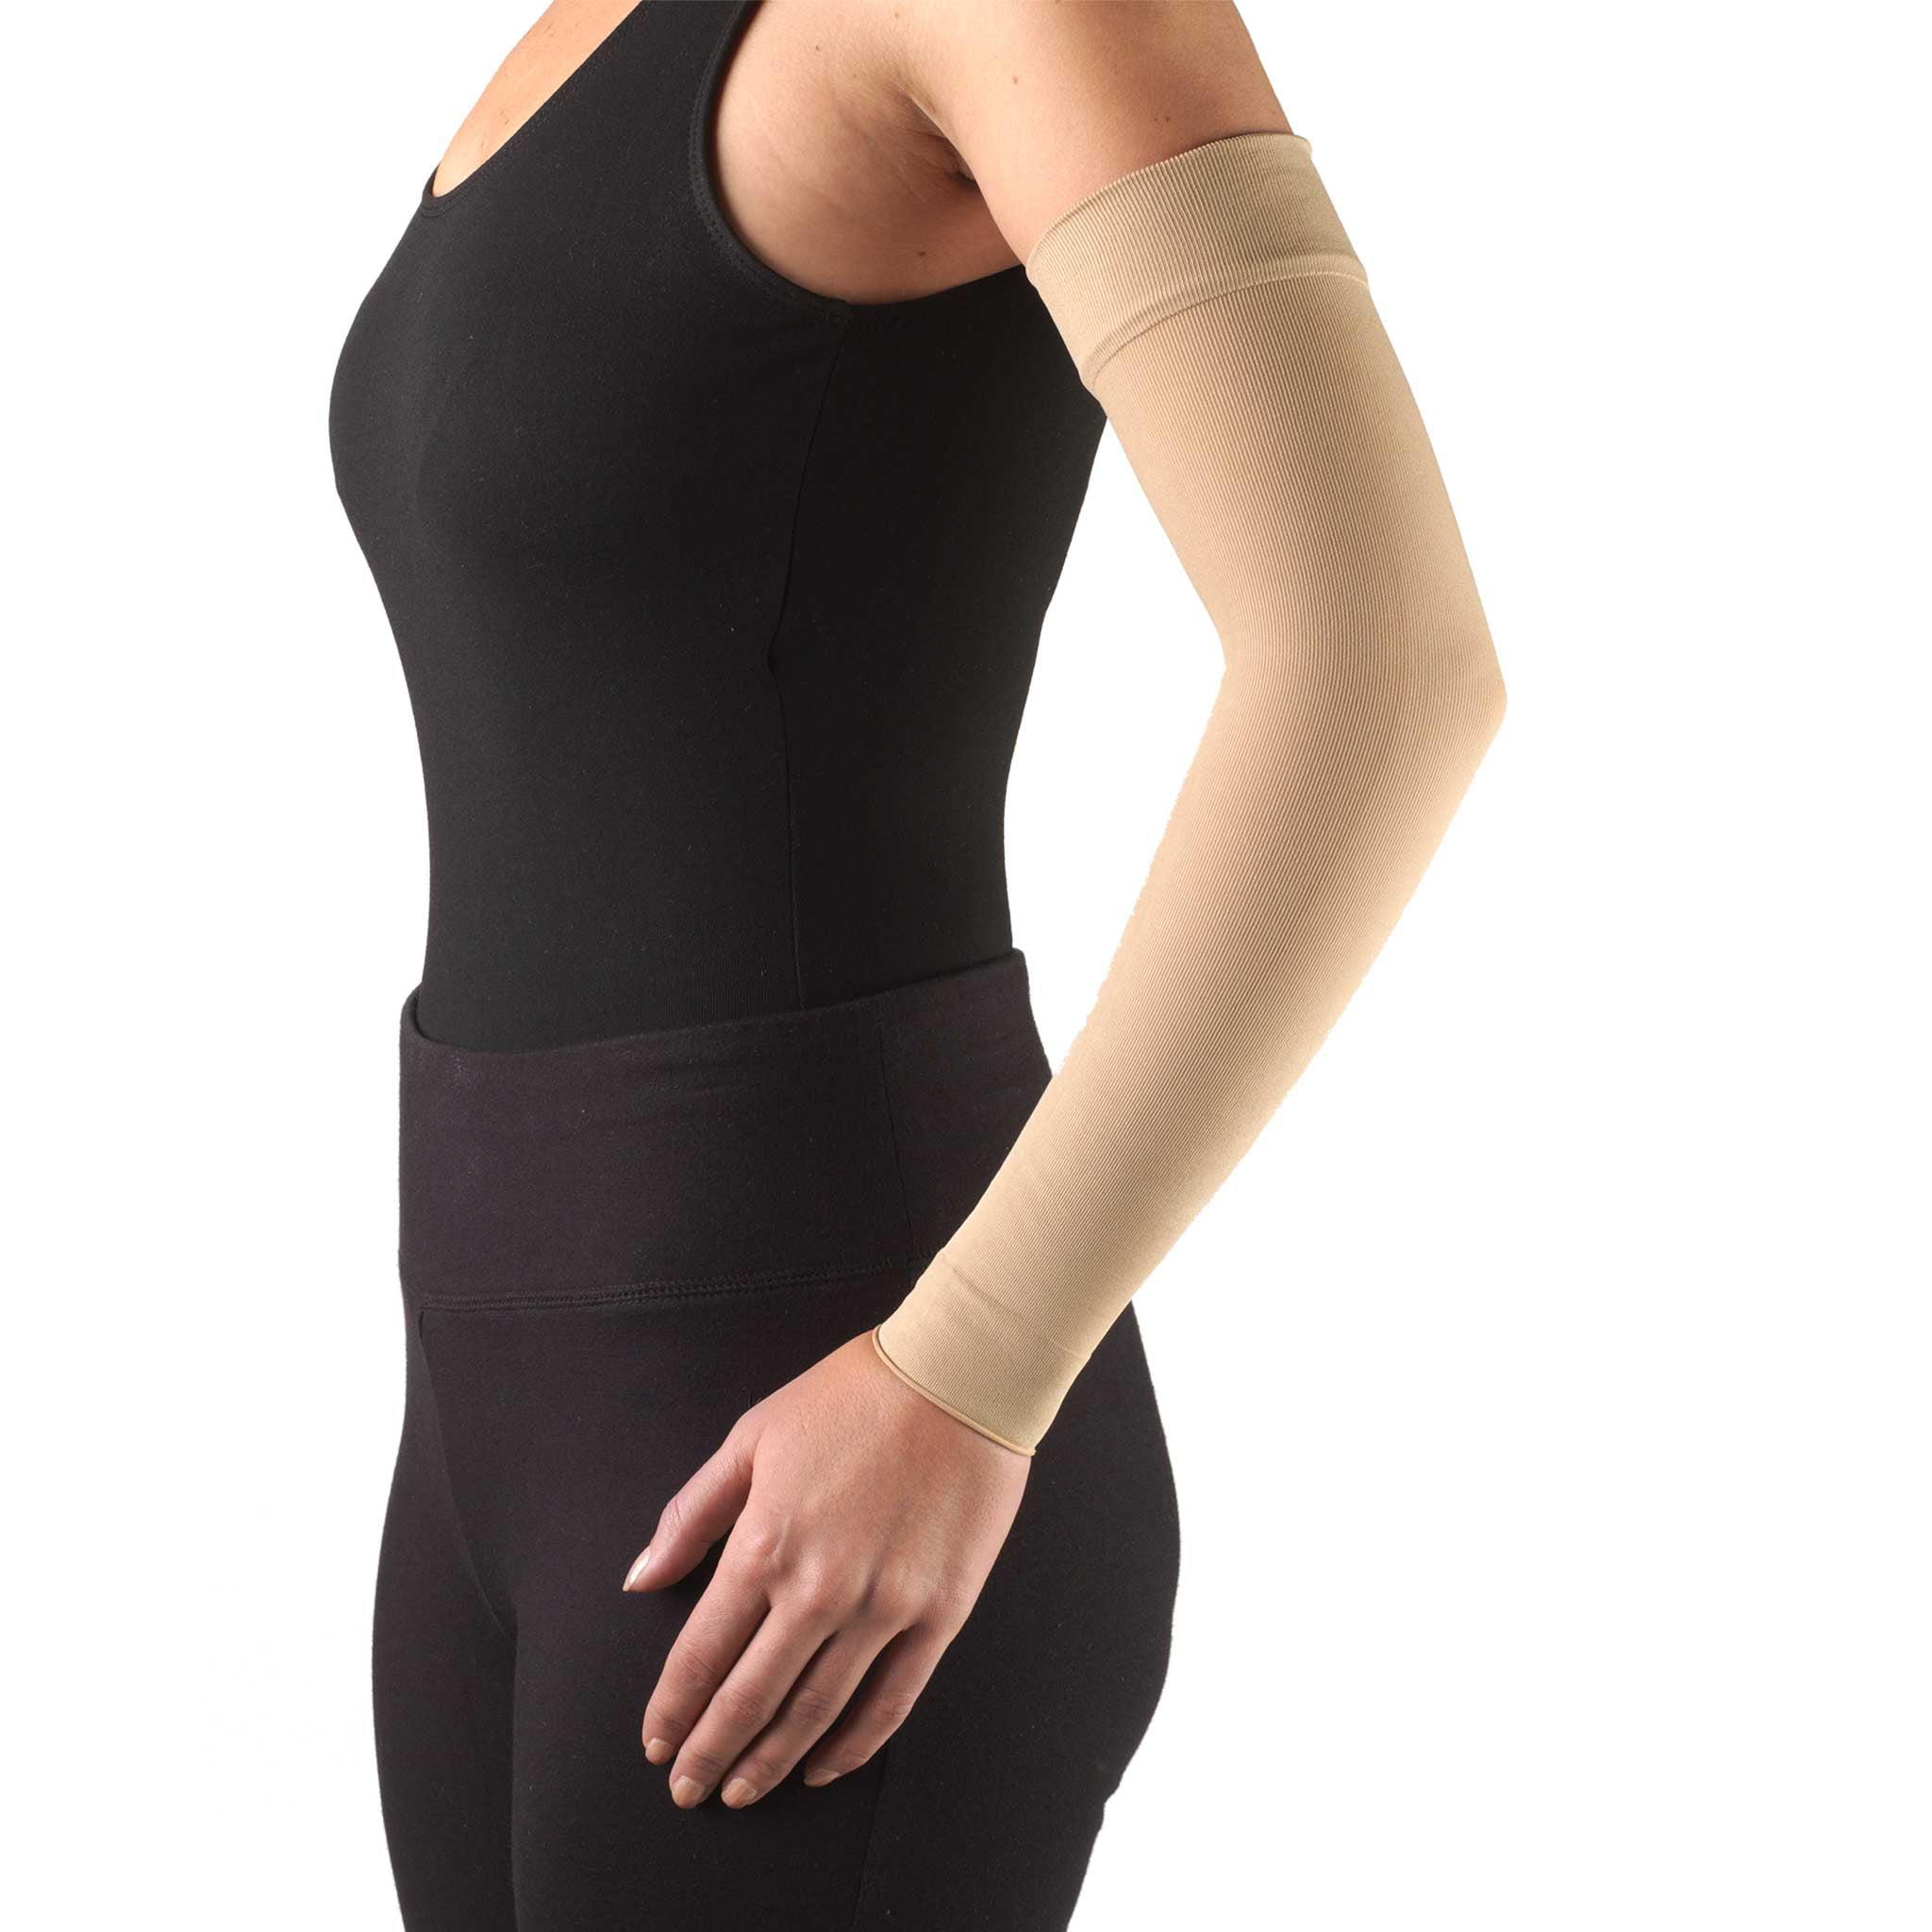 Truform Lymphedema Compression Arm Sleeve: 20-30 mmHg, Beige, Large